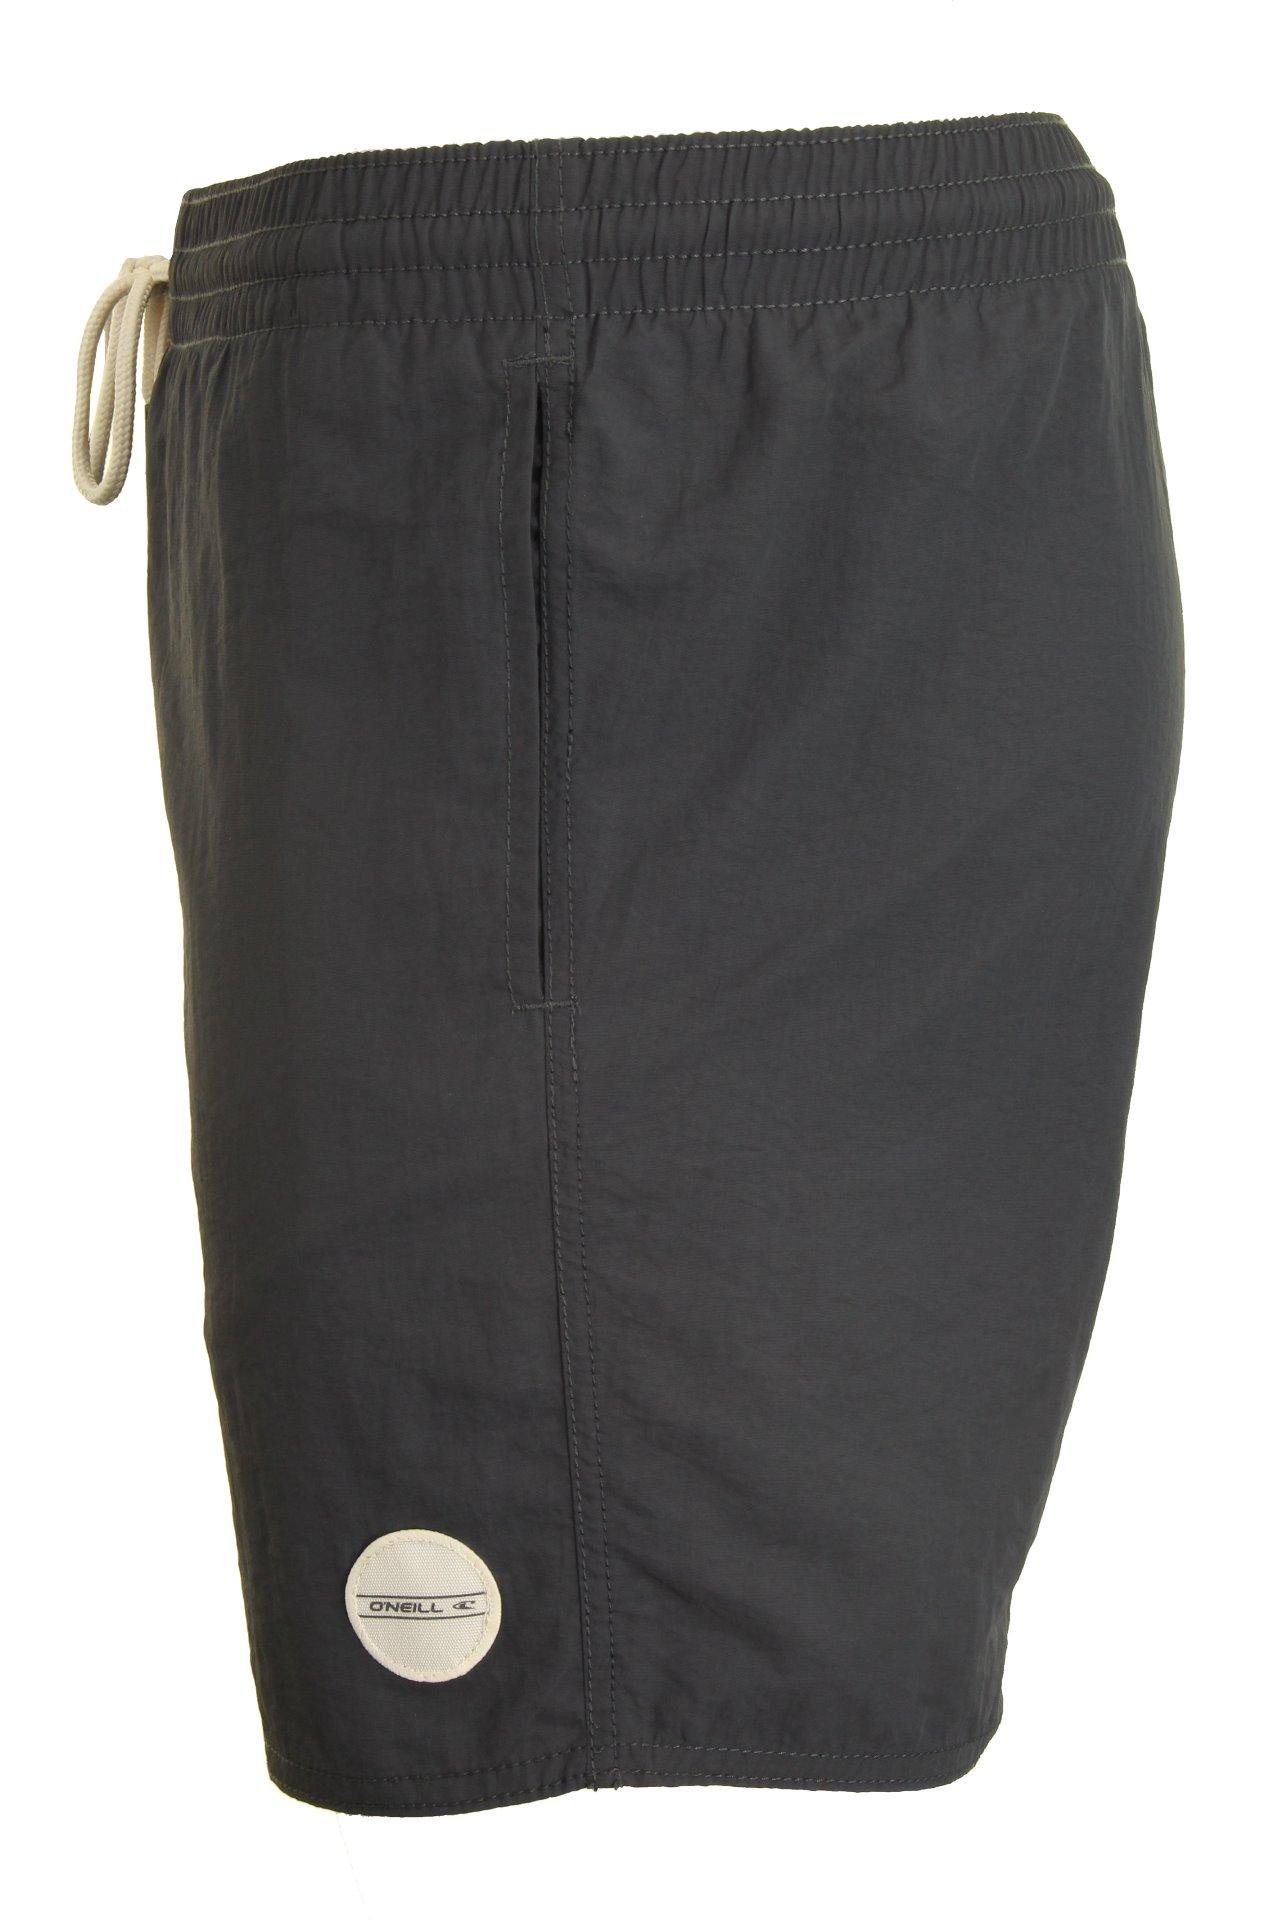 O-039-Neill-Mens-039-Vert-039-Swim-Board-Shorts thumbnail 4